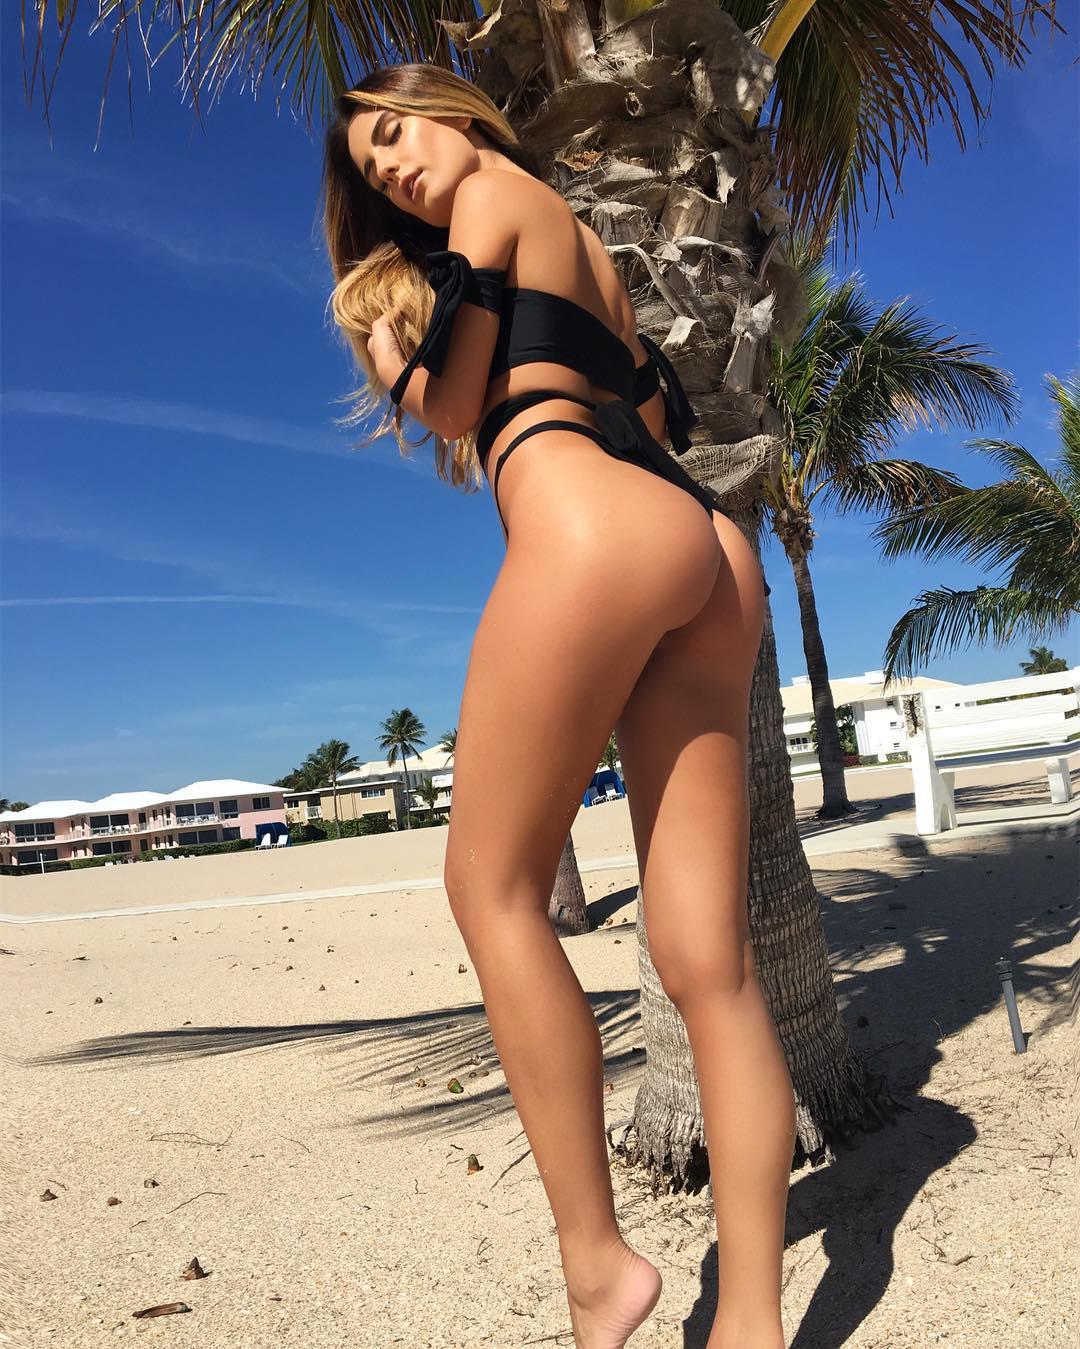 Images Bianca Ghezzi nudes (46 photos), Tits, Fappening, Instagram, lingerie 2020